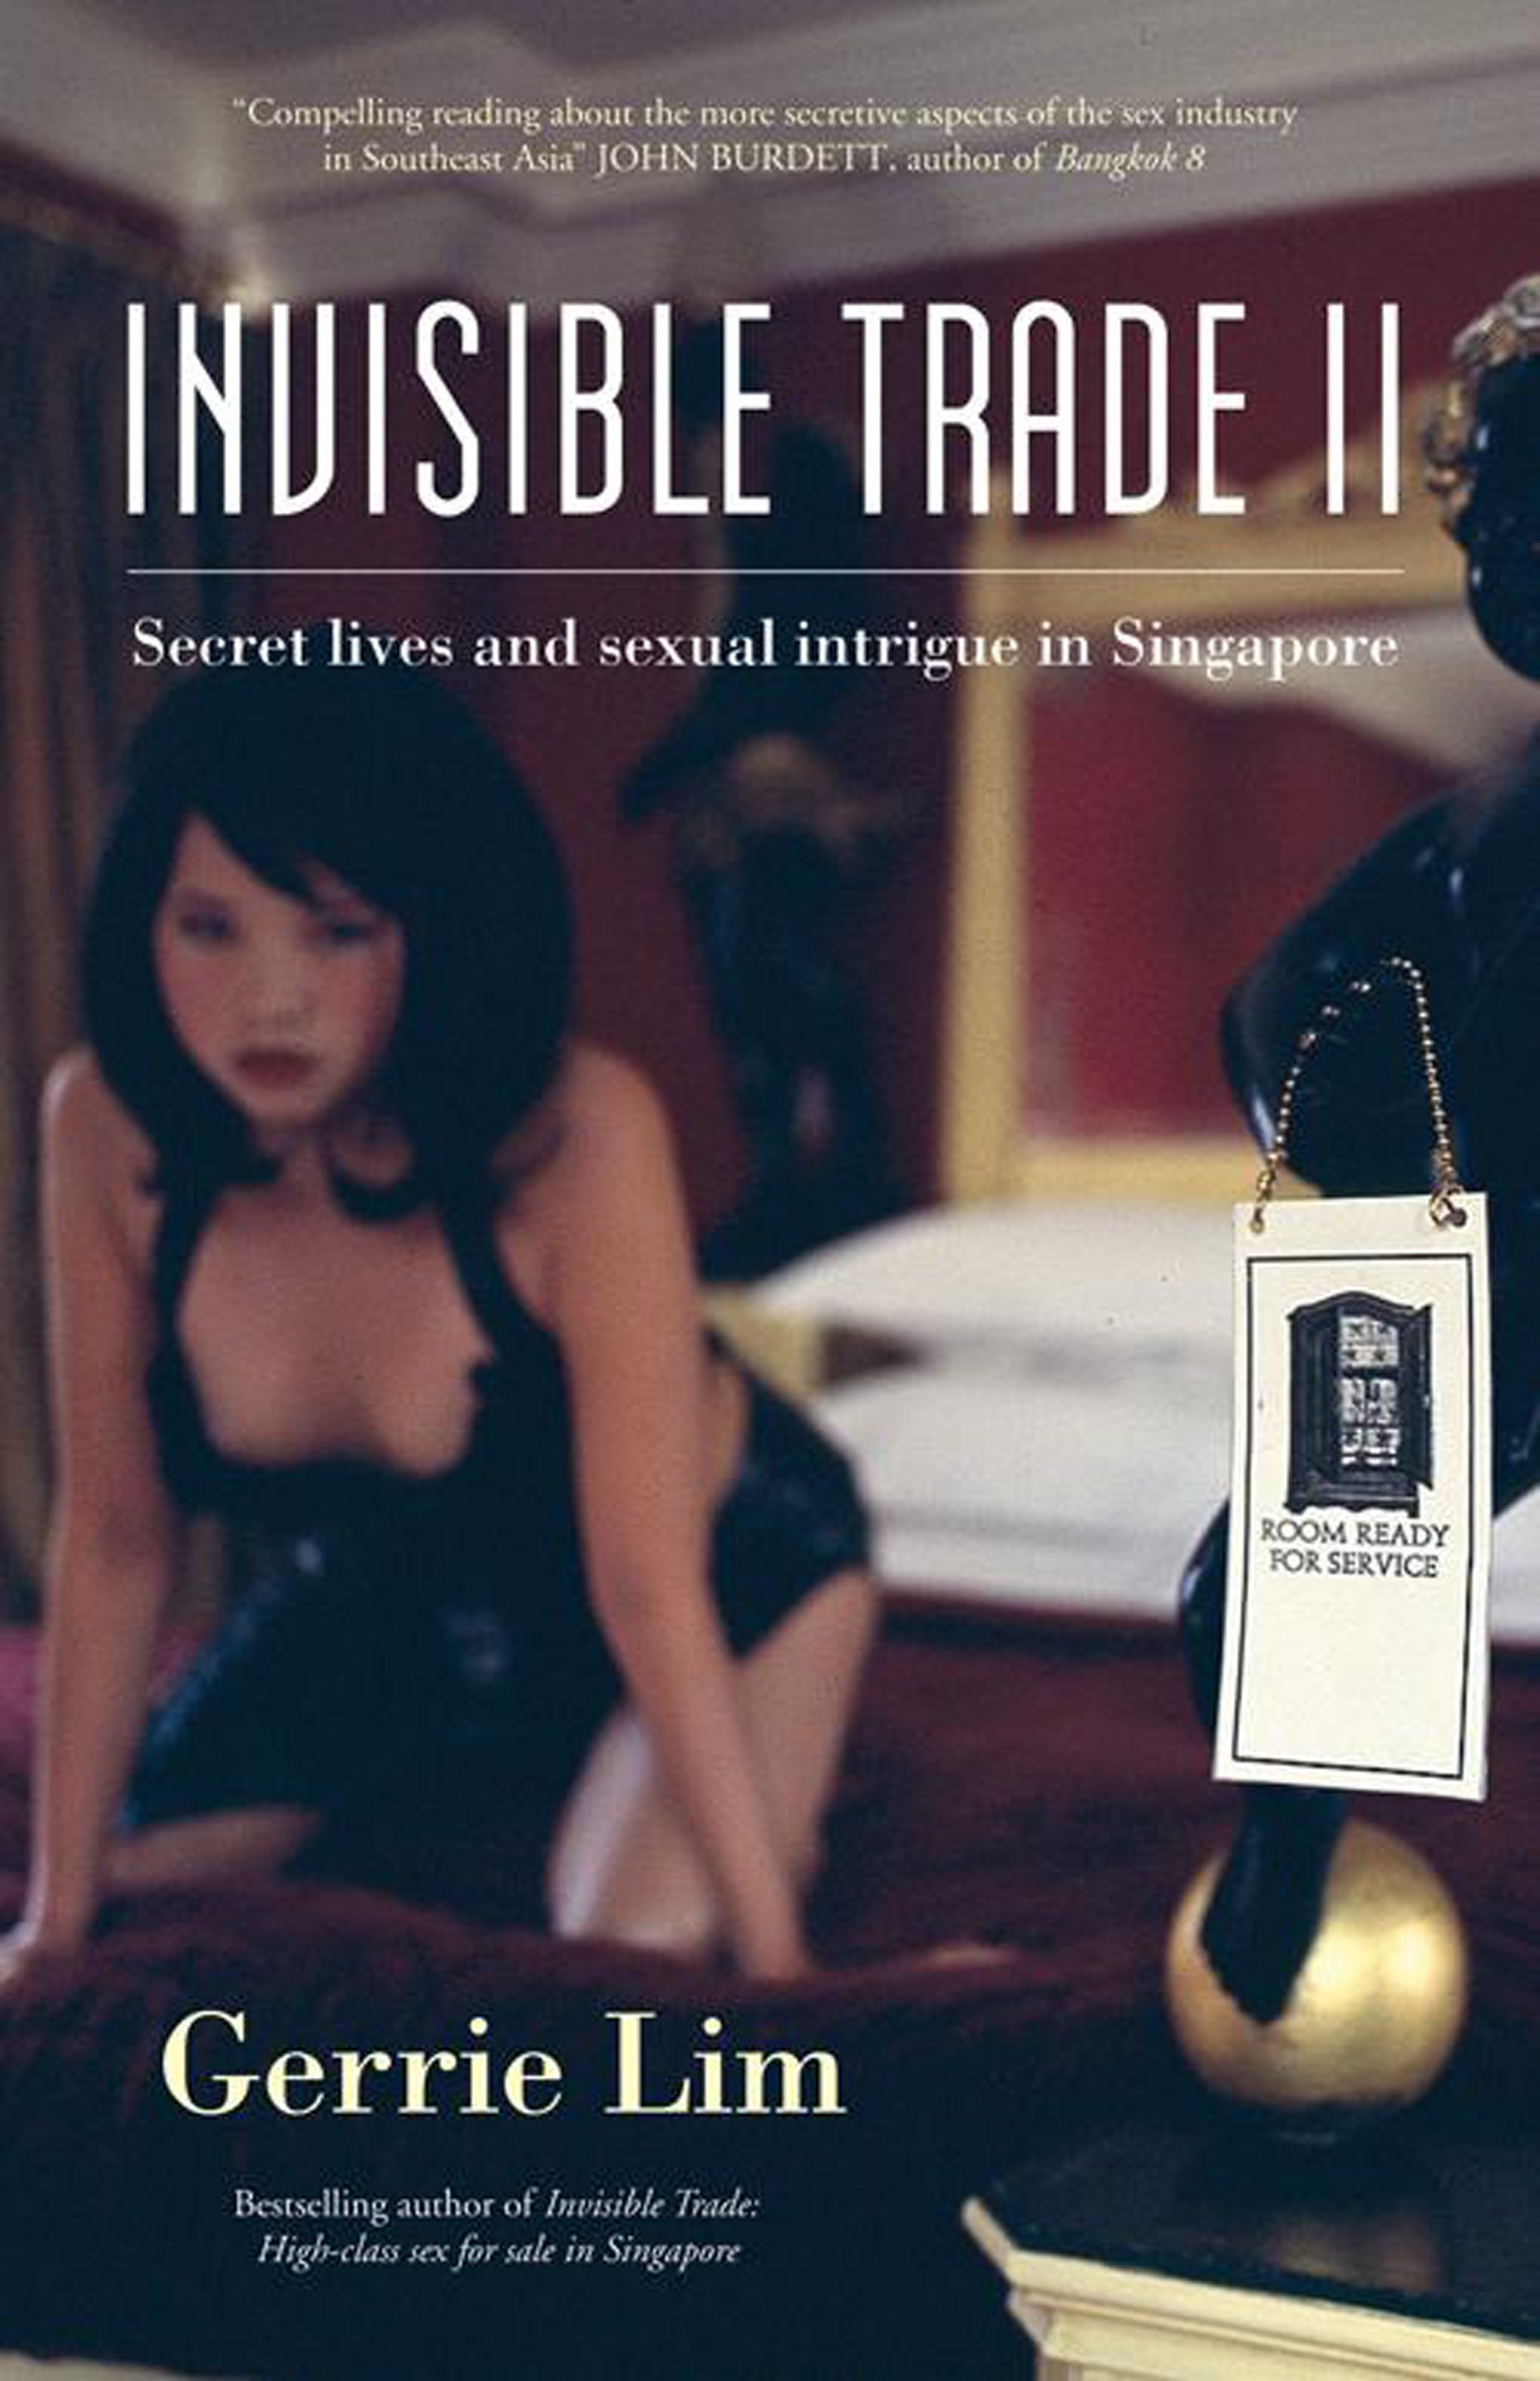 Amazon.com: Invisible Trade II (9789810592097): Lim, Gerrie: Books